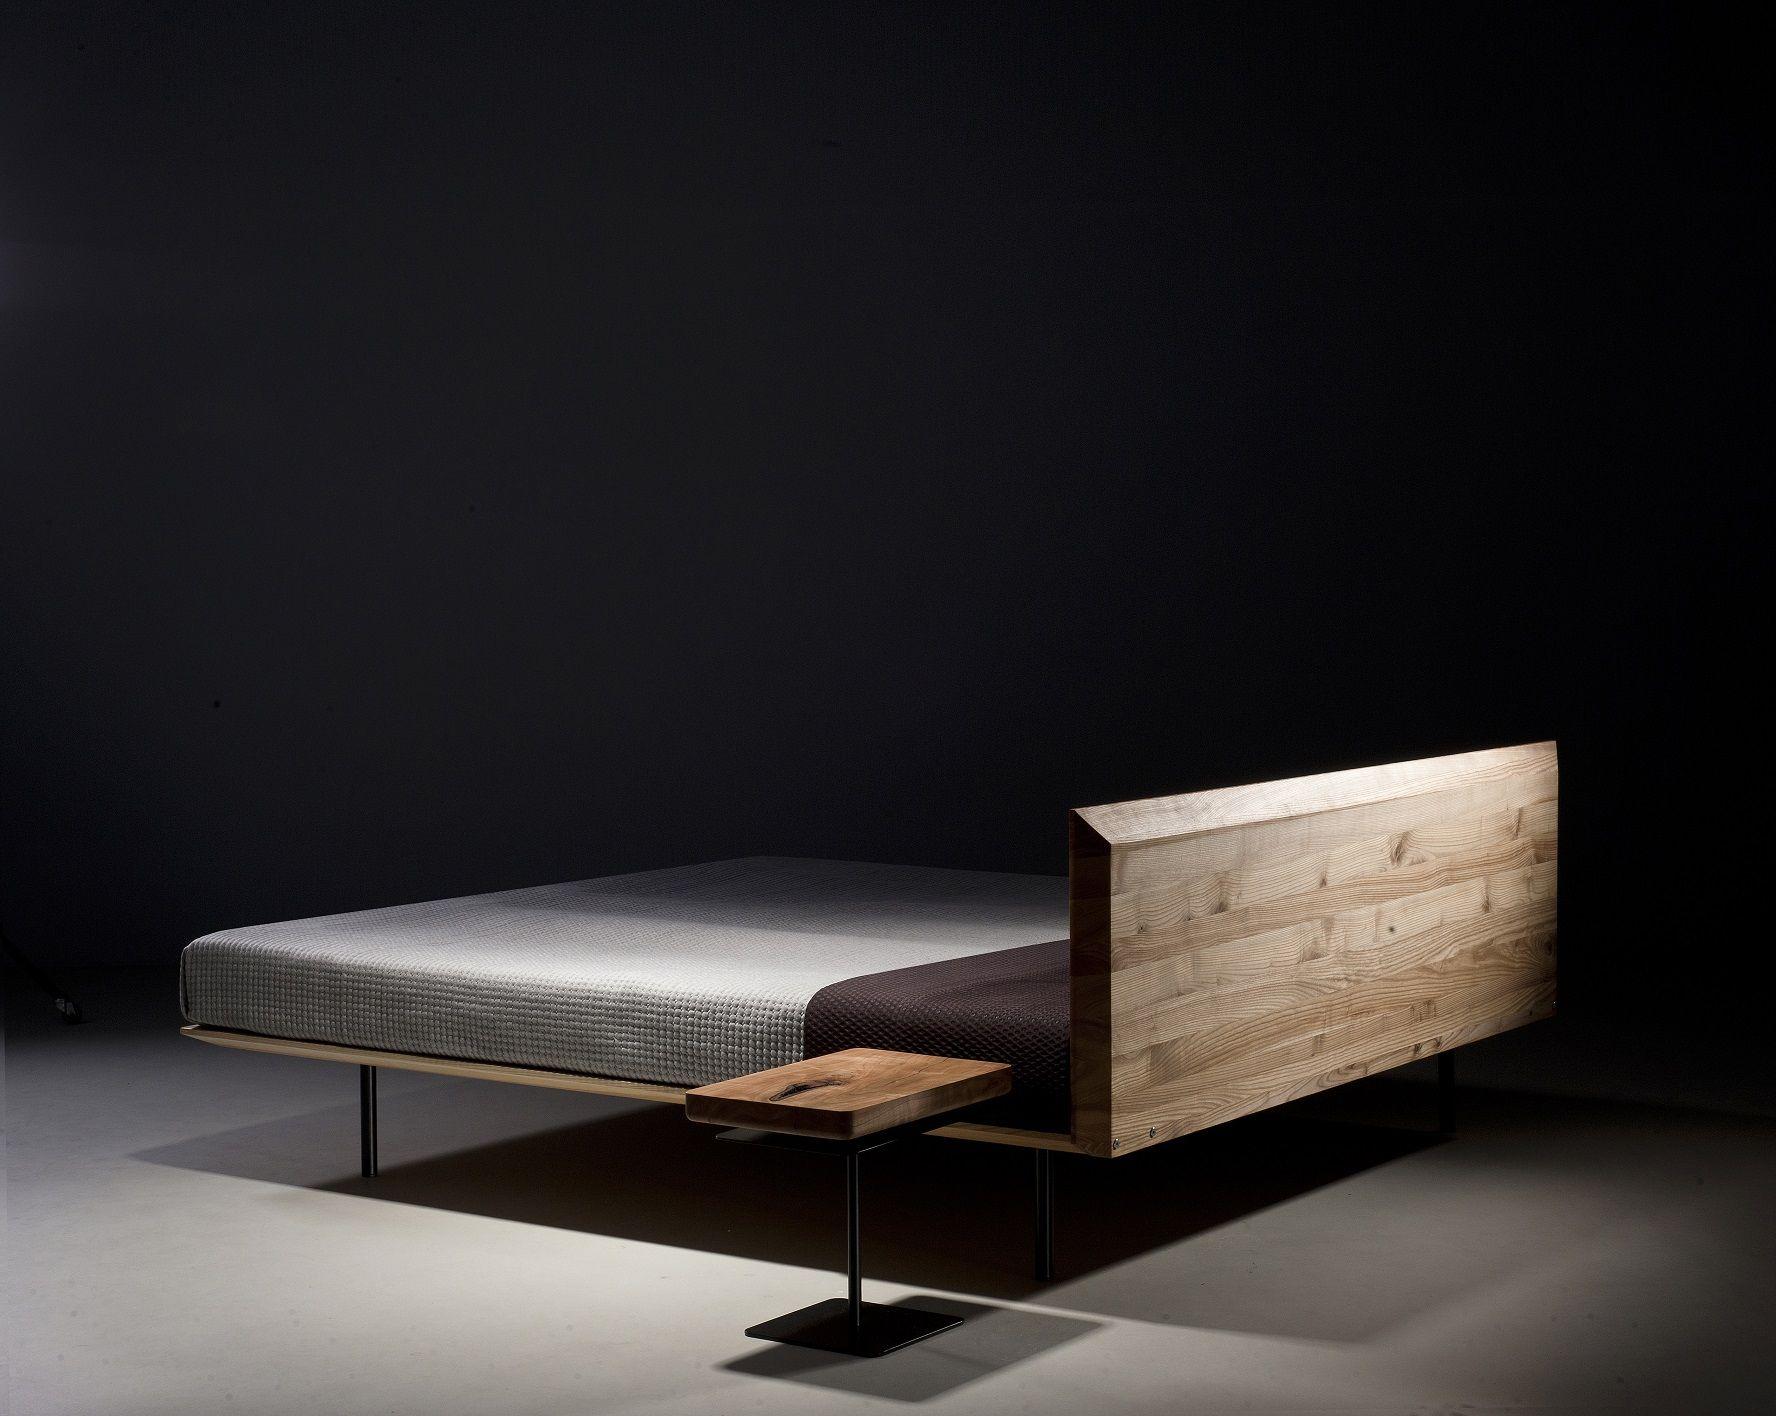 16 best mazzivo furniture design images on Pinterest